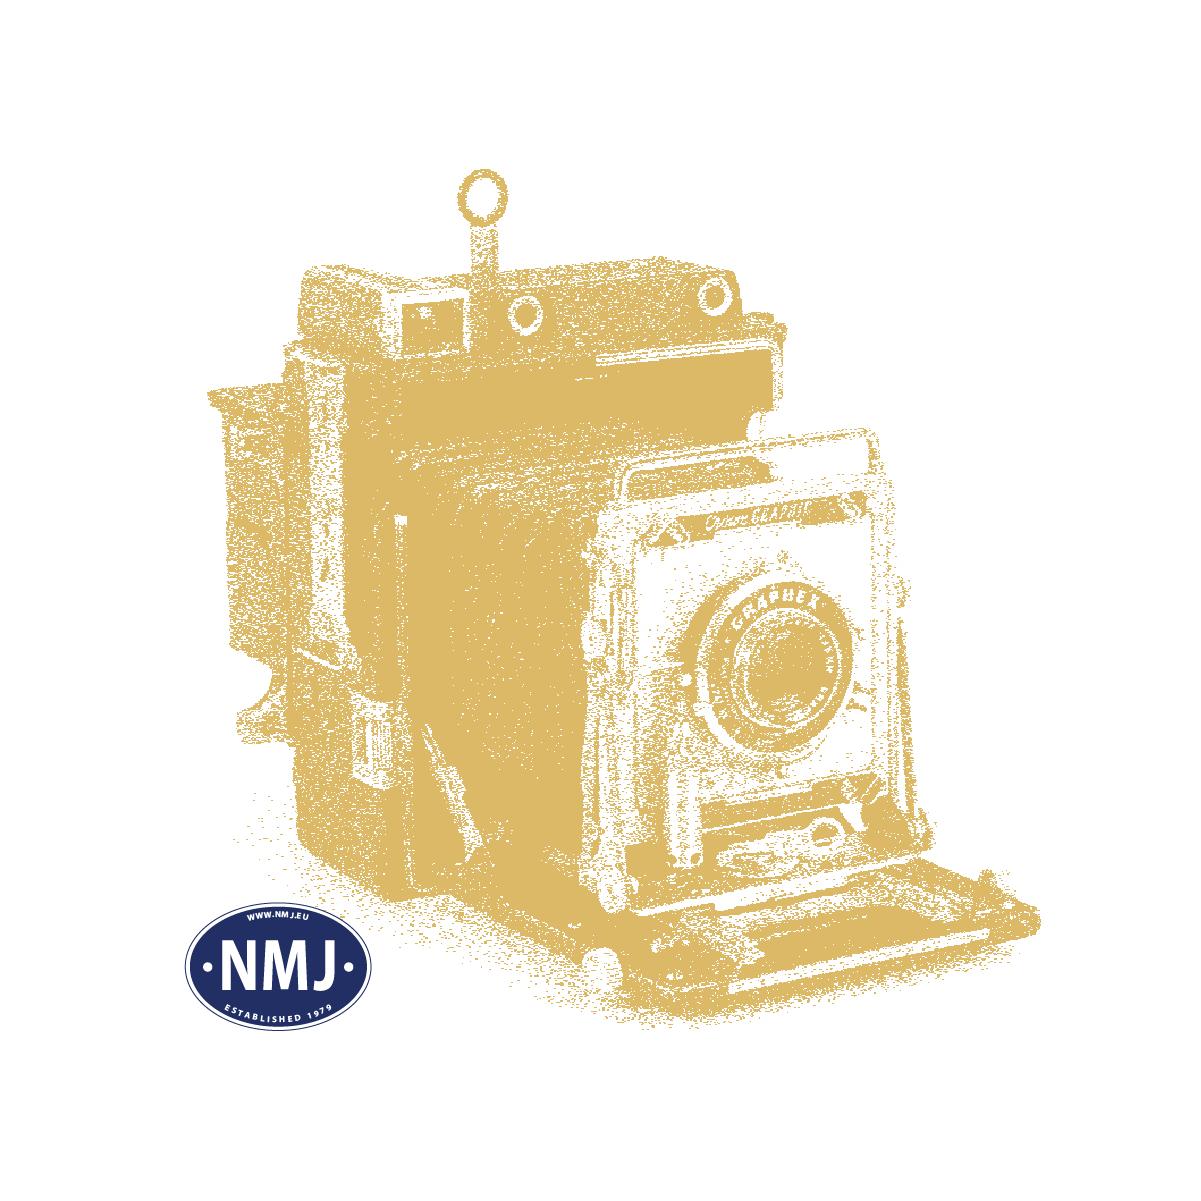 NMJT90016 - NMJ Topline NSB Di3a.618, neues Design, DCC m/Sound